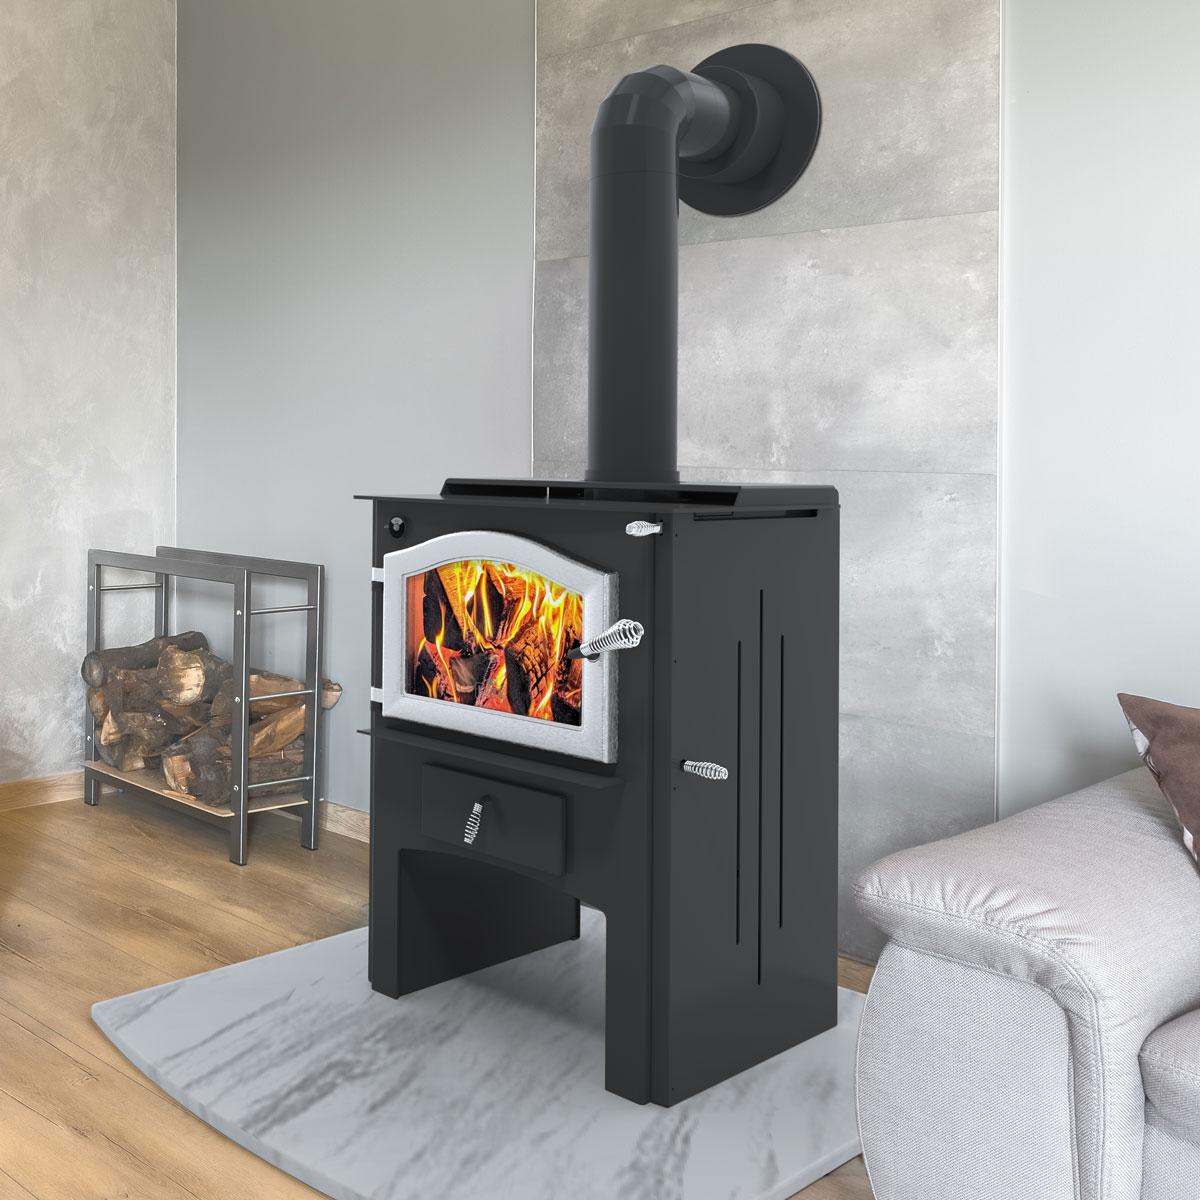 Kuma Aberdeen LE wood stove, made in the USA